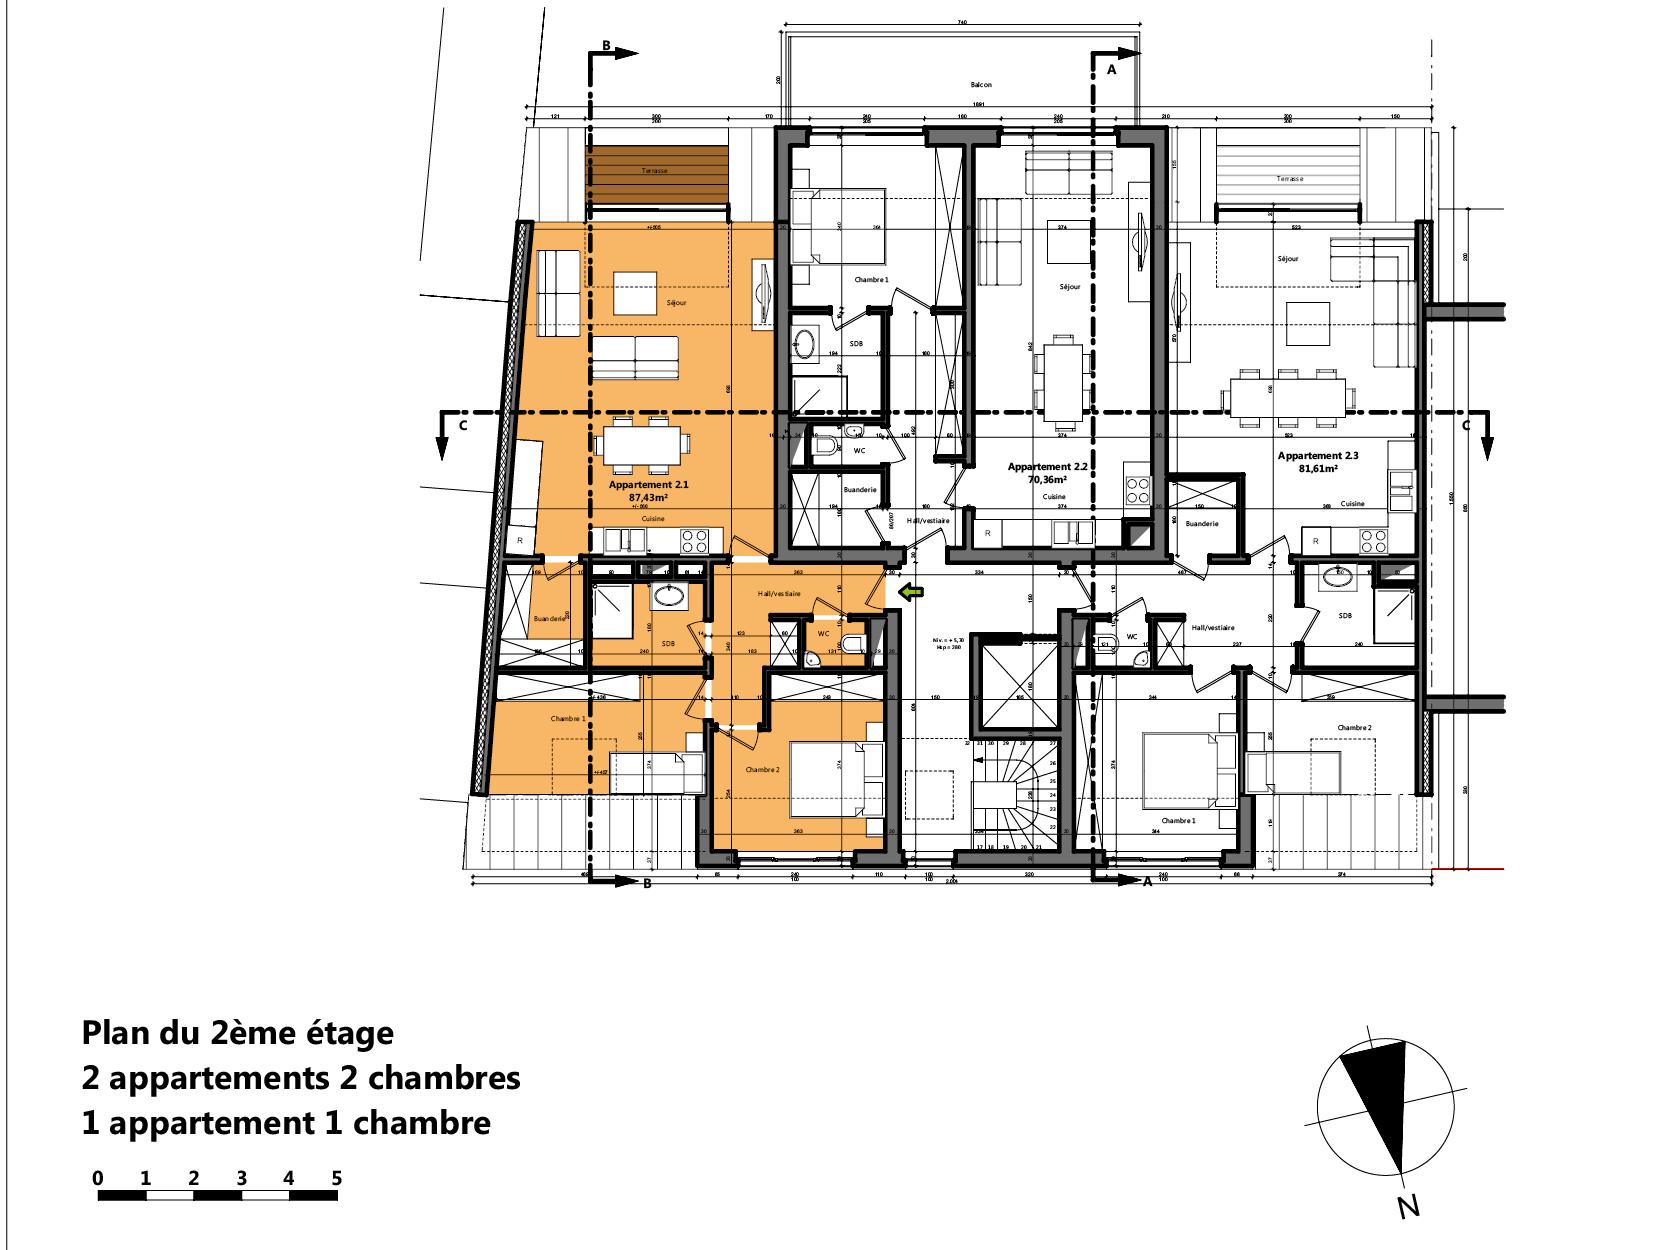 immeuble a appartement plan